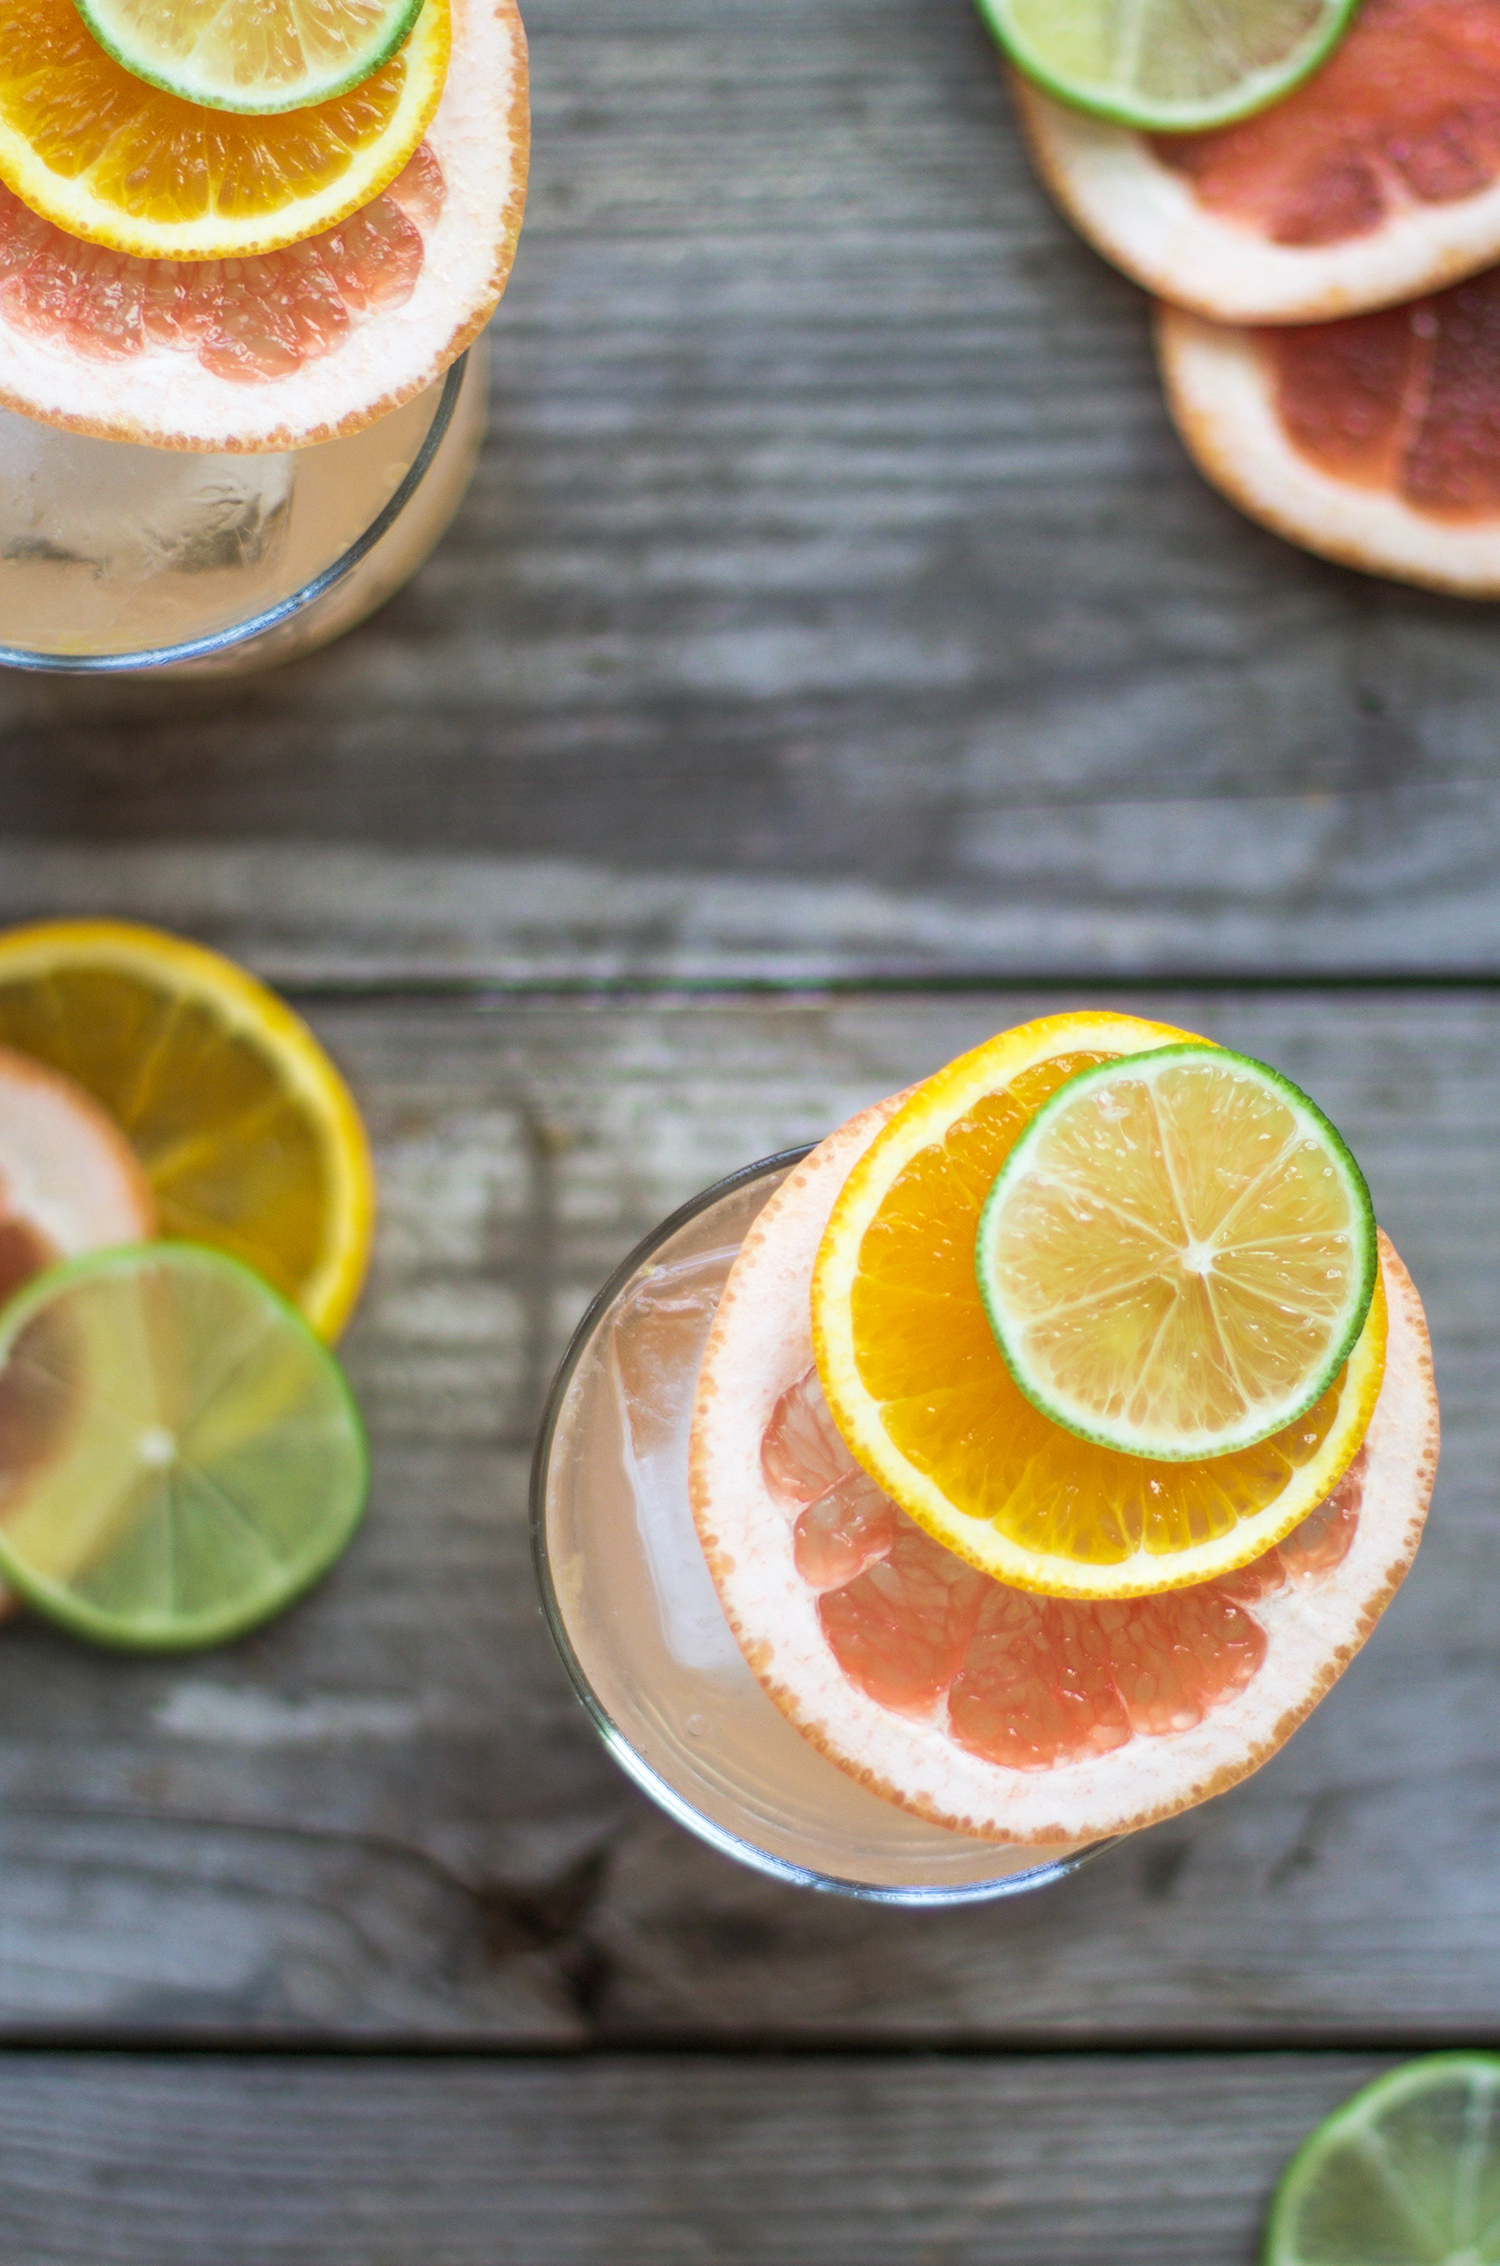 Mom's 5 O'Clock Citrus Vodka Soda